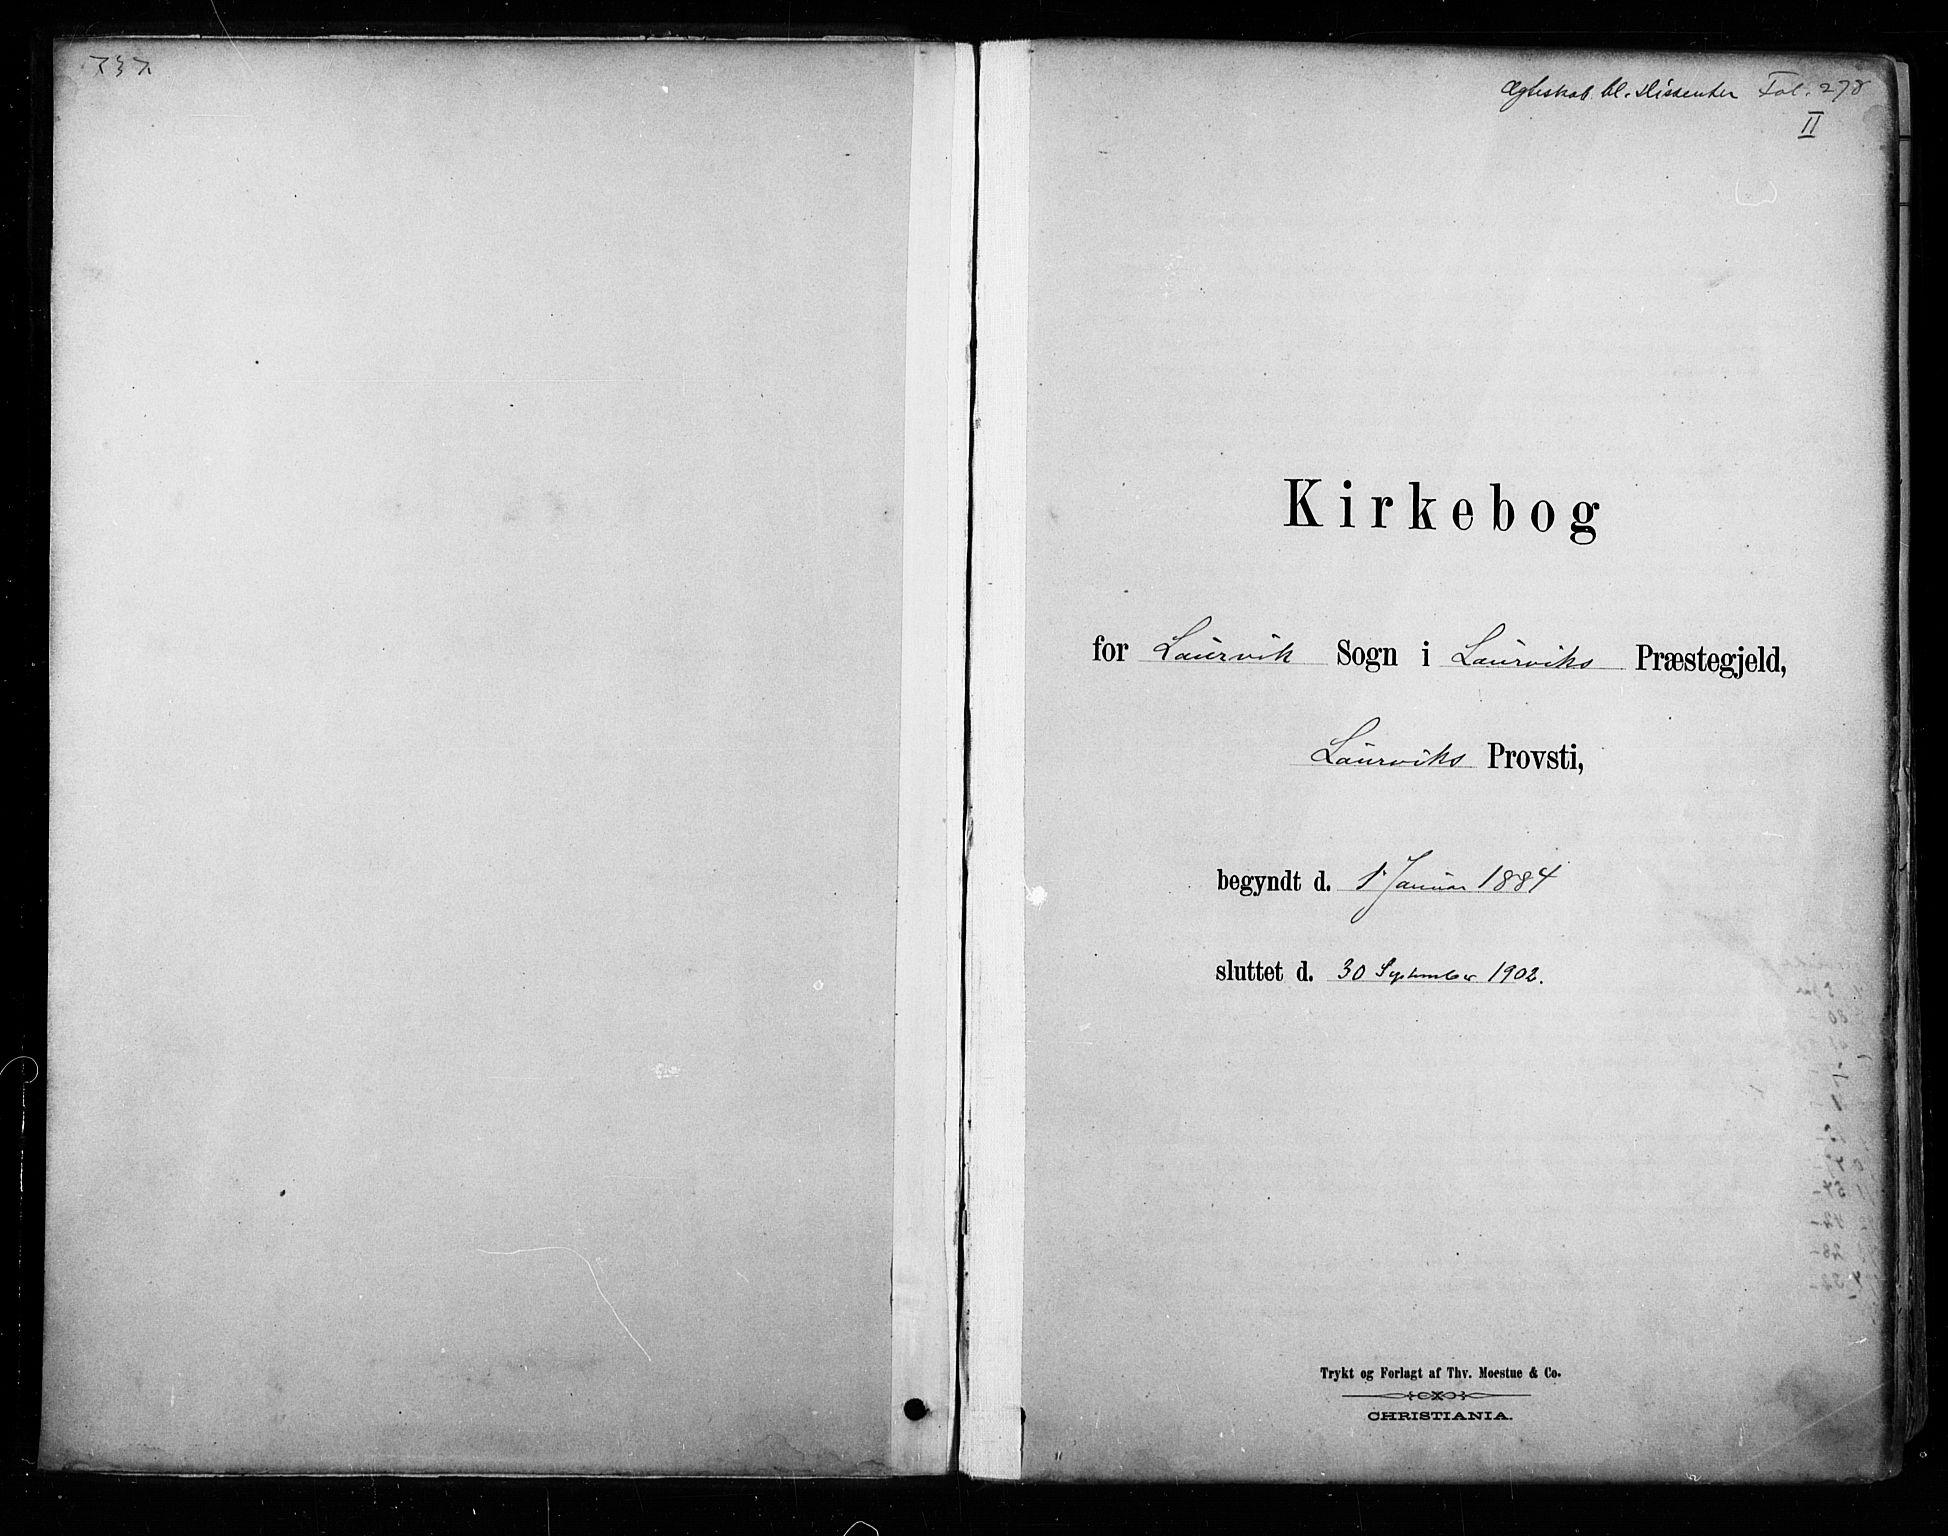 SAKO, Larvik kirkebøker, F/Fa/L0008: Ministerialbok nr. I 8, 1884-1902